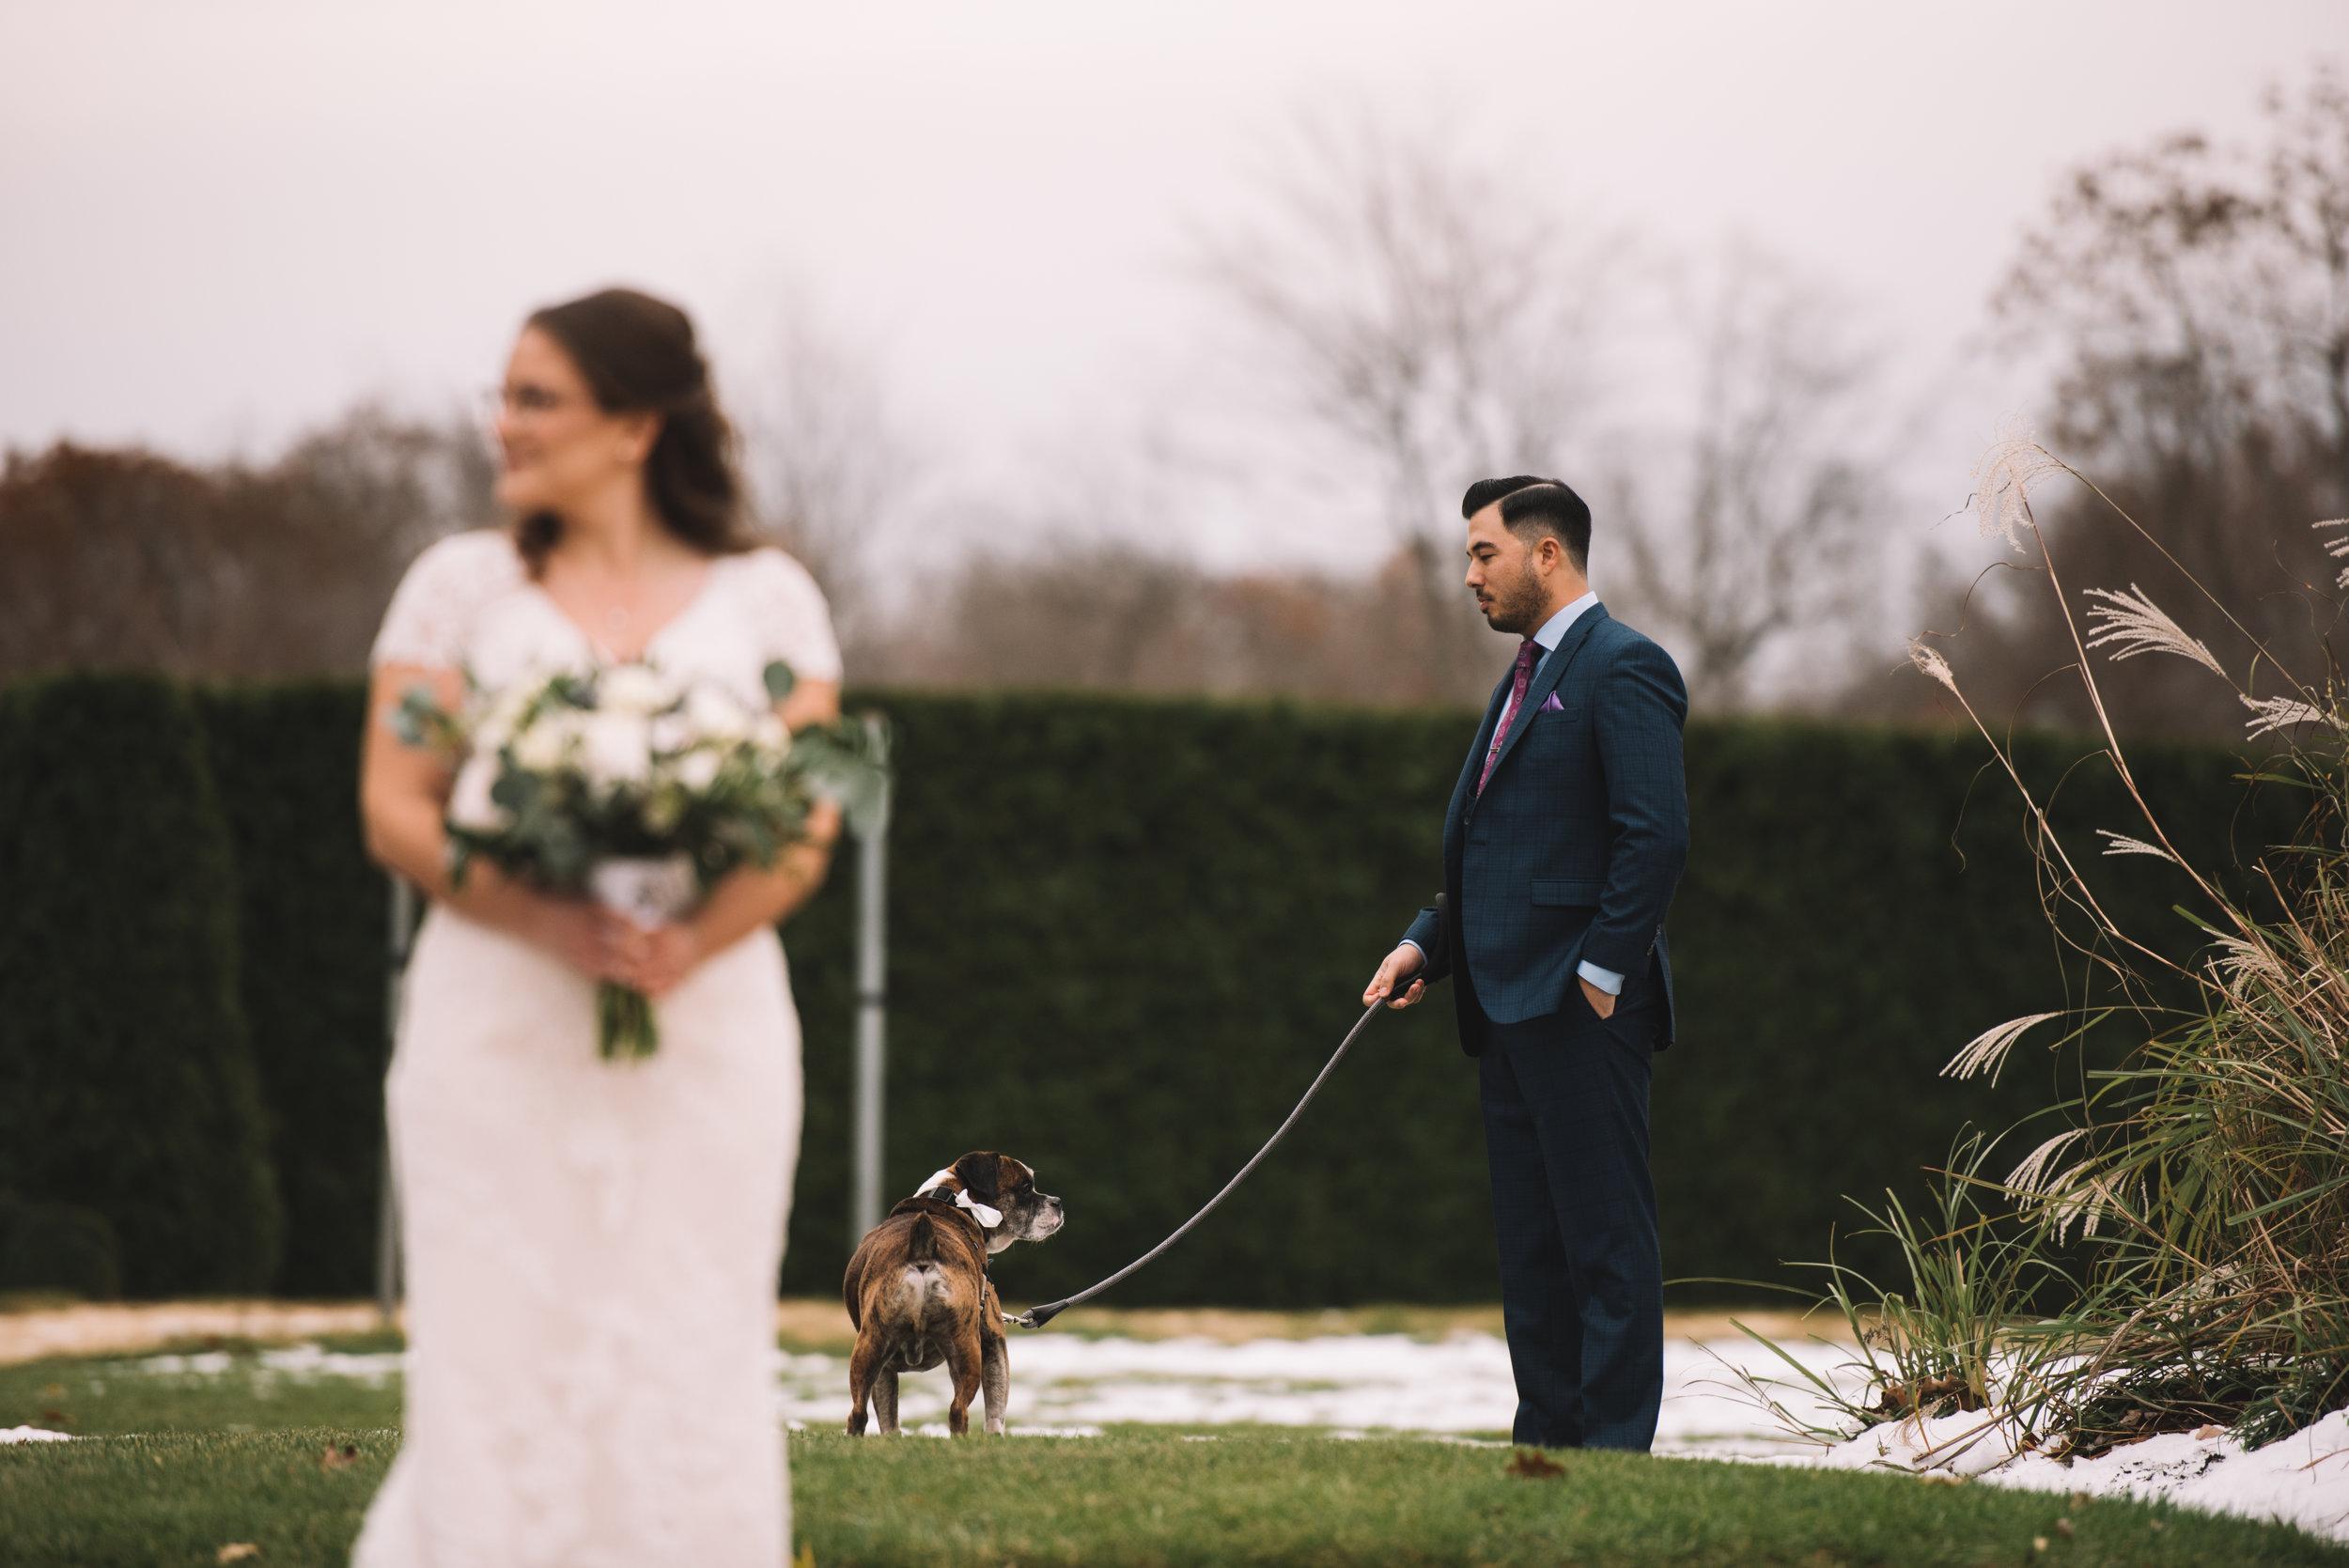 WeddingPhotos | NJPhotographer | Highlights-8-31.jpg